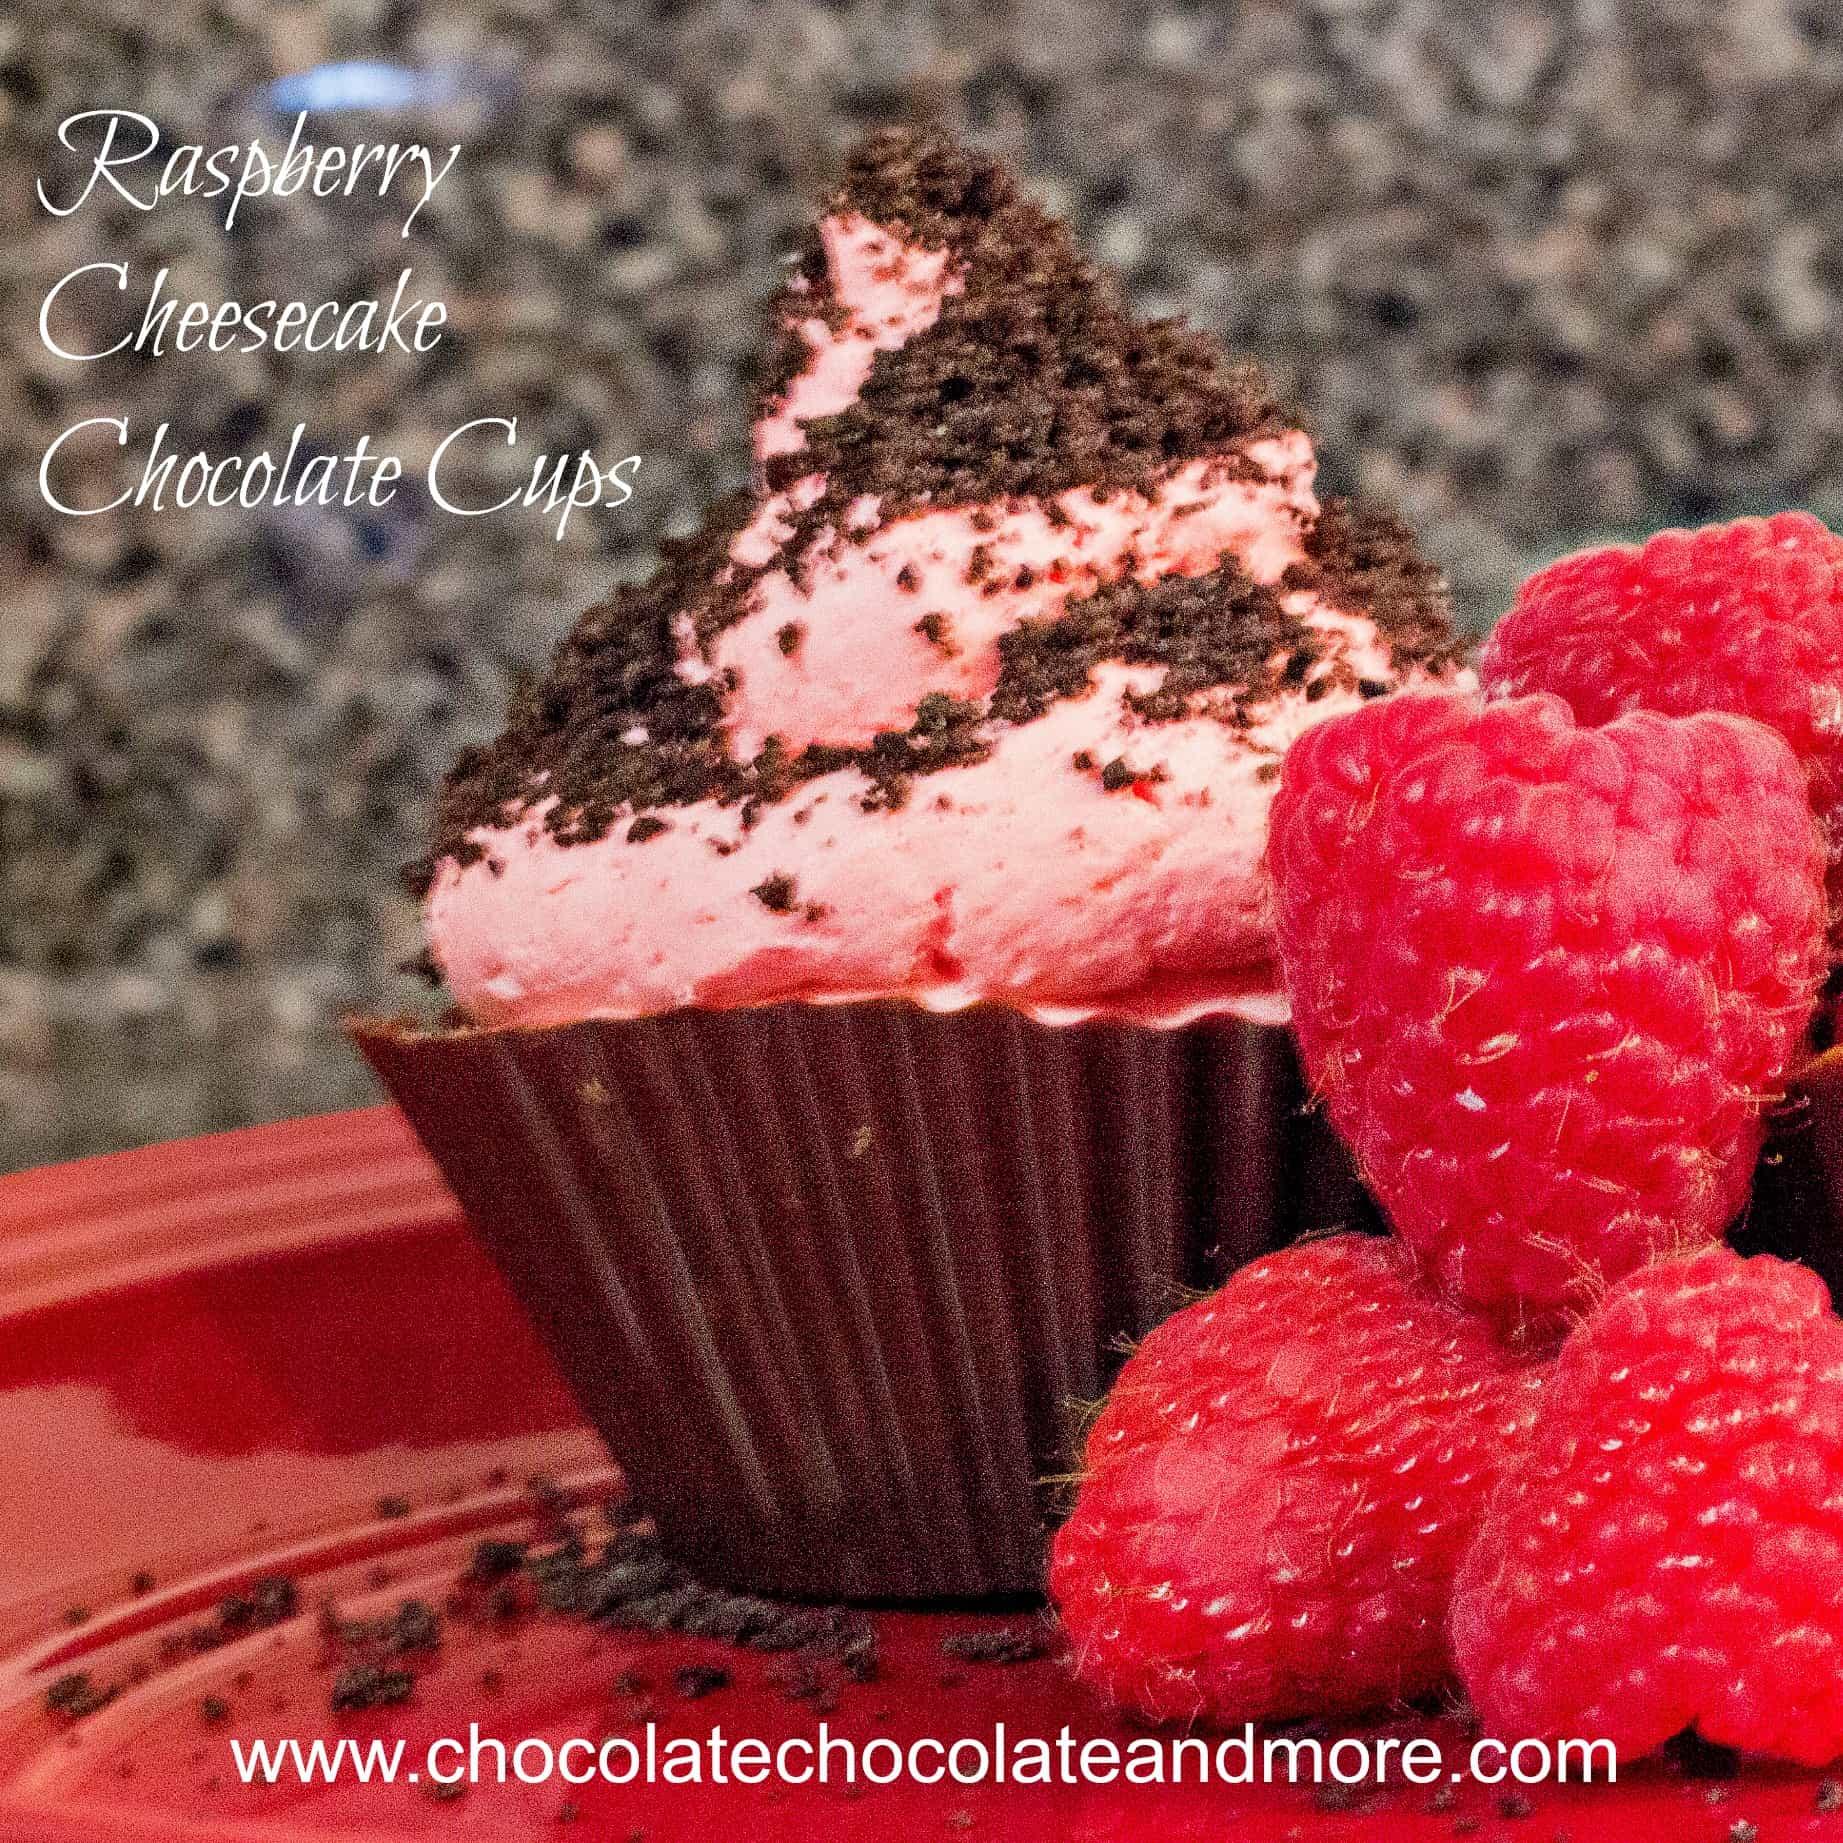 Raspberry Cheescake Chocolate Cups